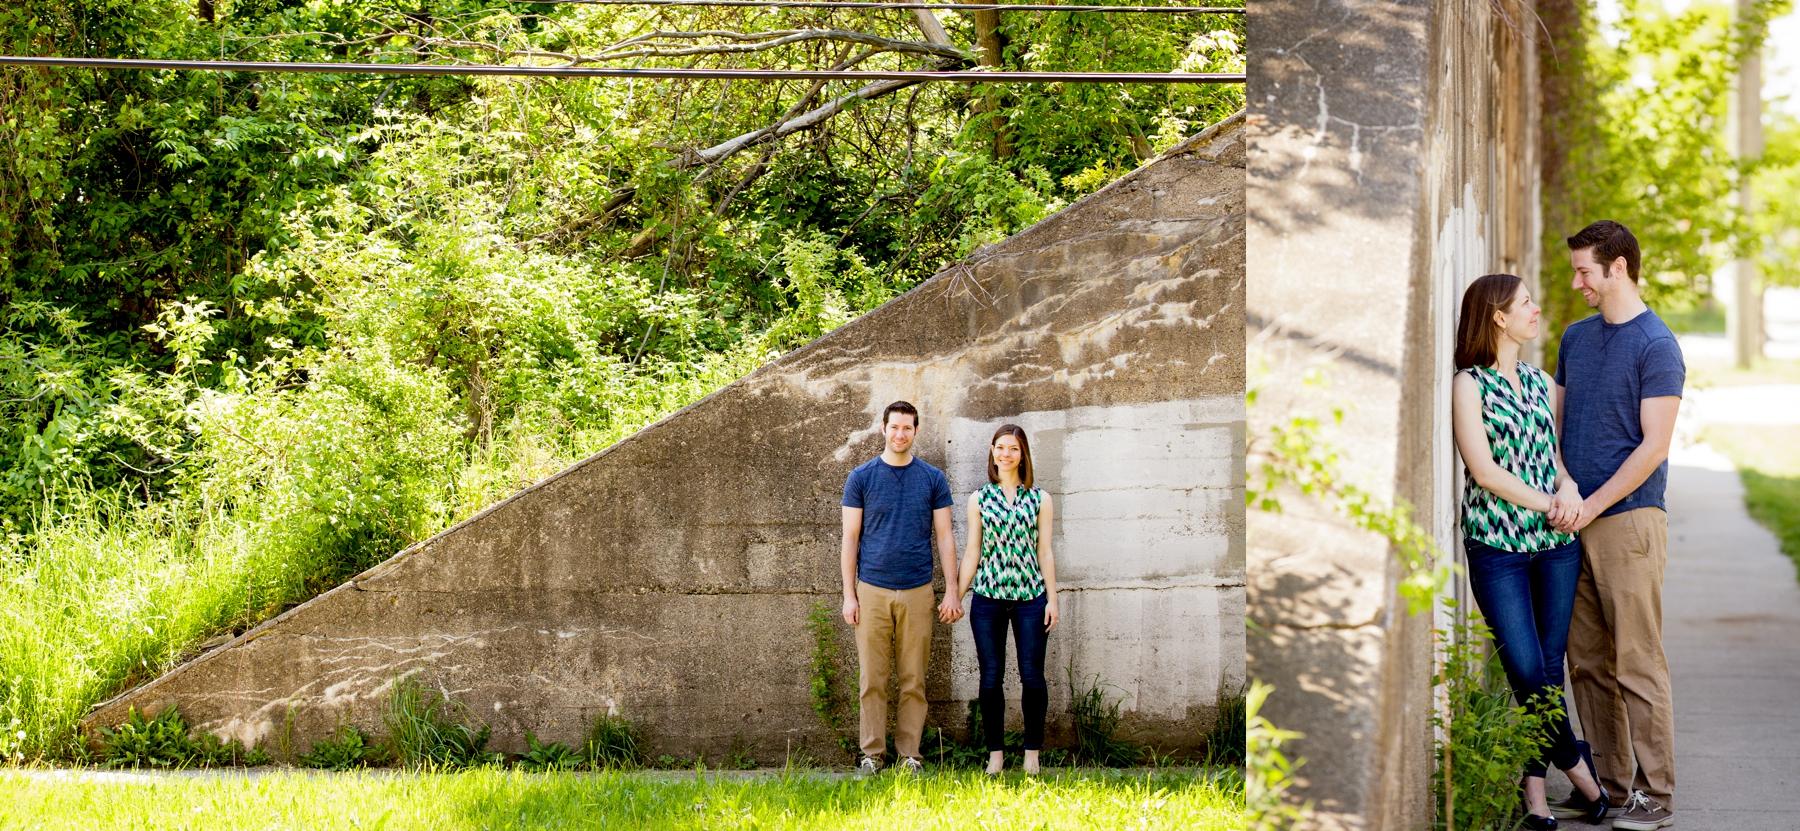 Brandon_Shafer_Photography_Michele_Chris_Michigan_Grand_Rapids_City_Engagement_0025.jpg